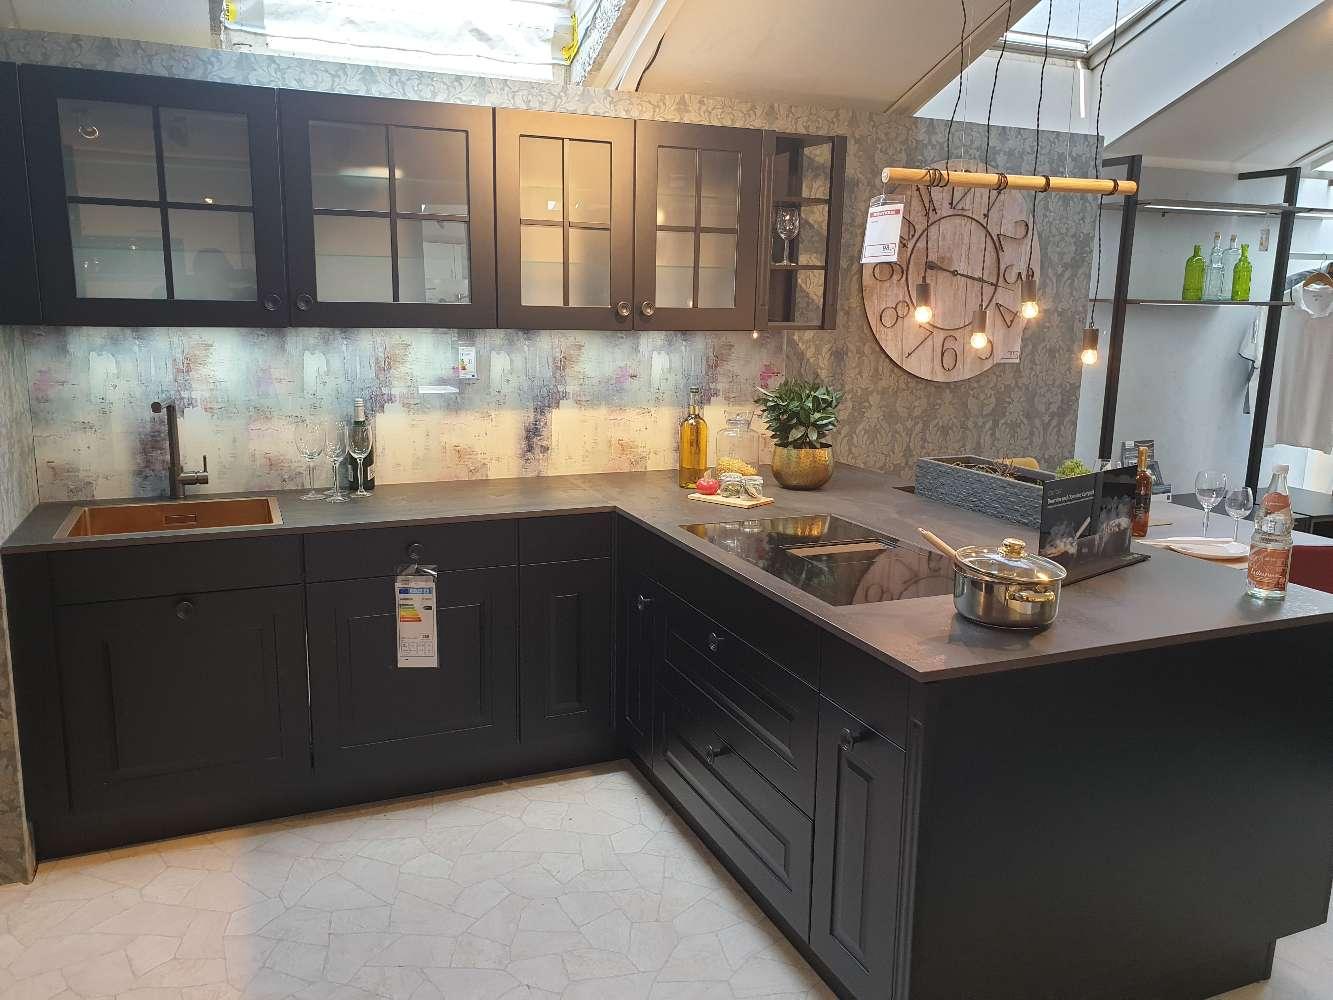 Prisma Einabuküche mit Gaggenau E-Geräte inkl. Dekton Arbeitsplatte